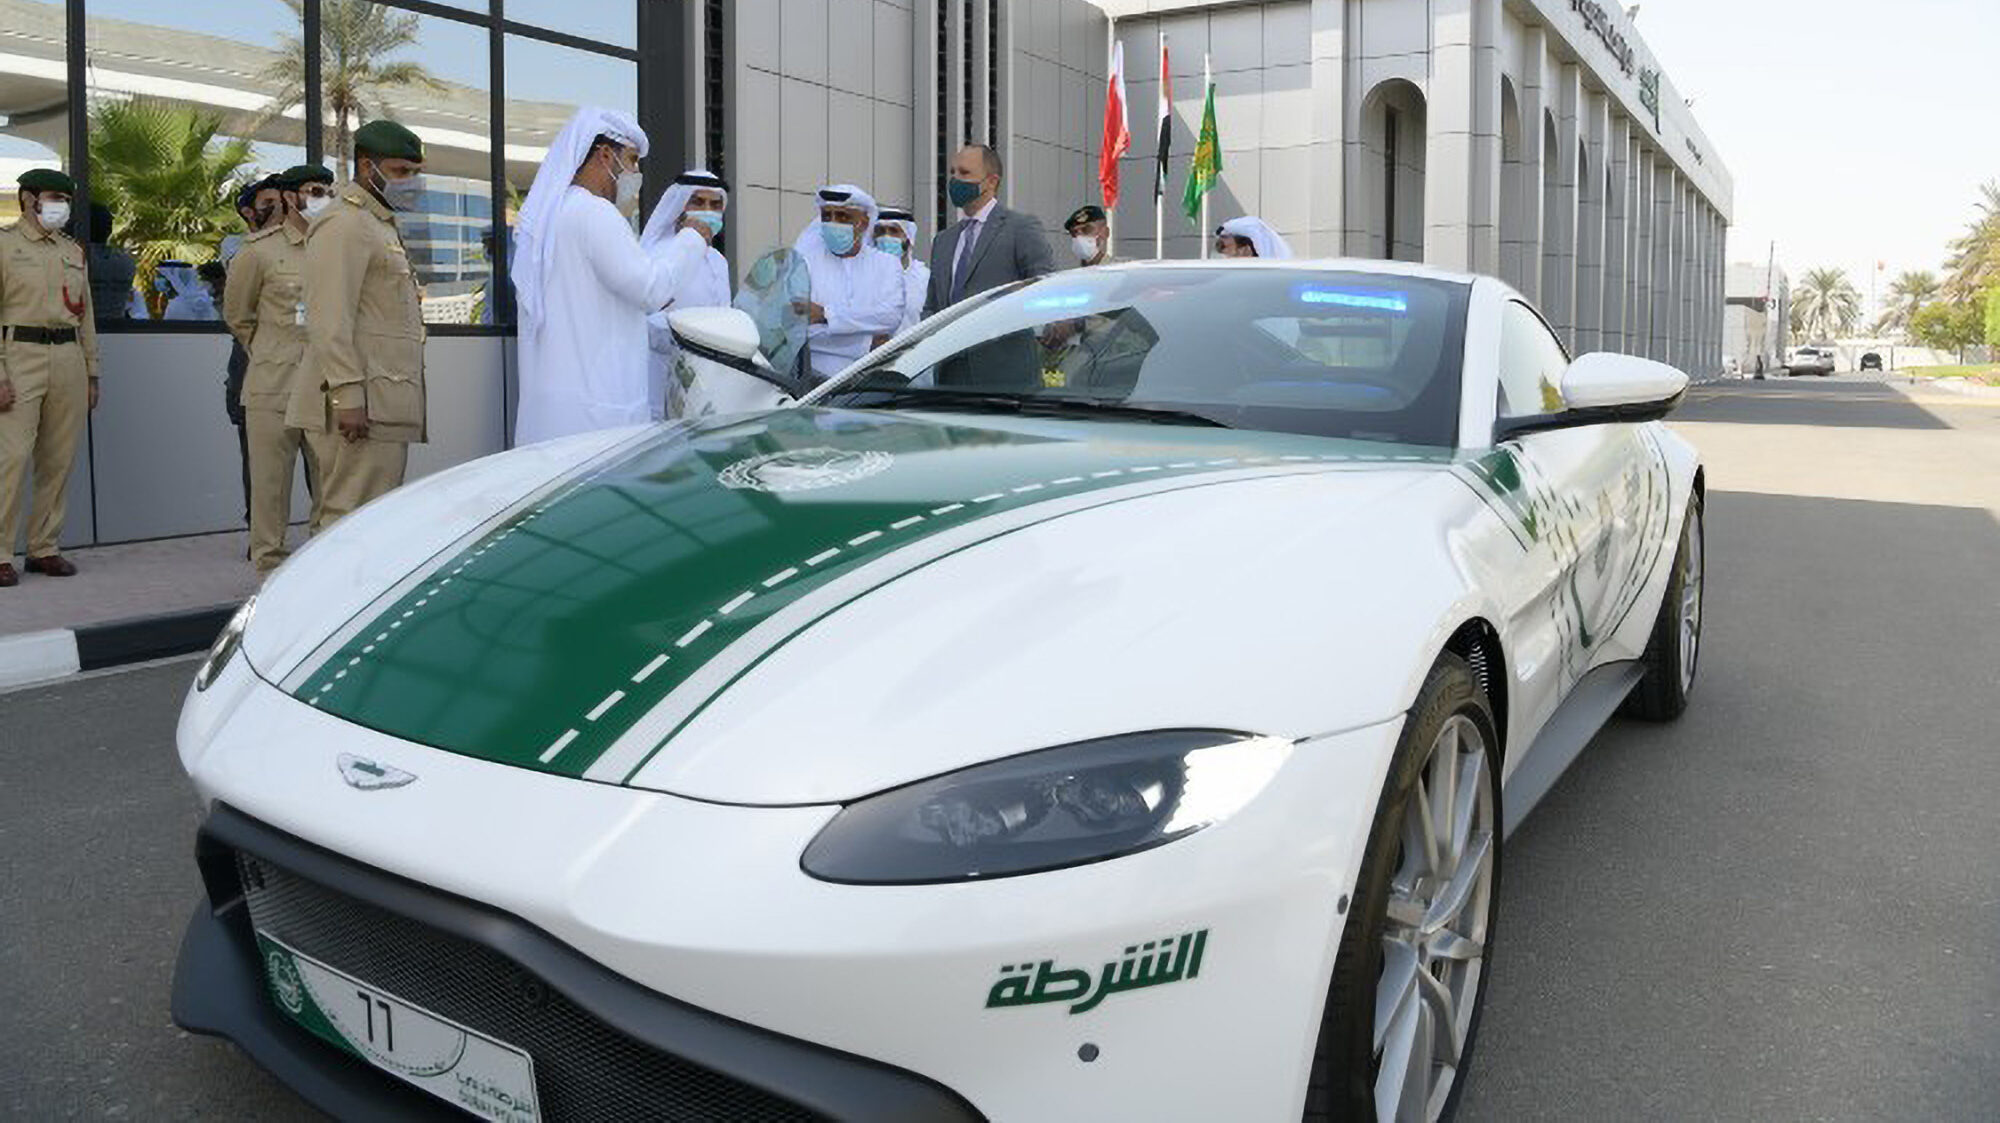 Aston Out-Smartin: Police Add 195-mph Bond Supercar To Fleet To Outrun Crooks